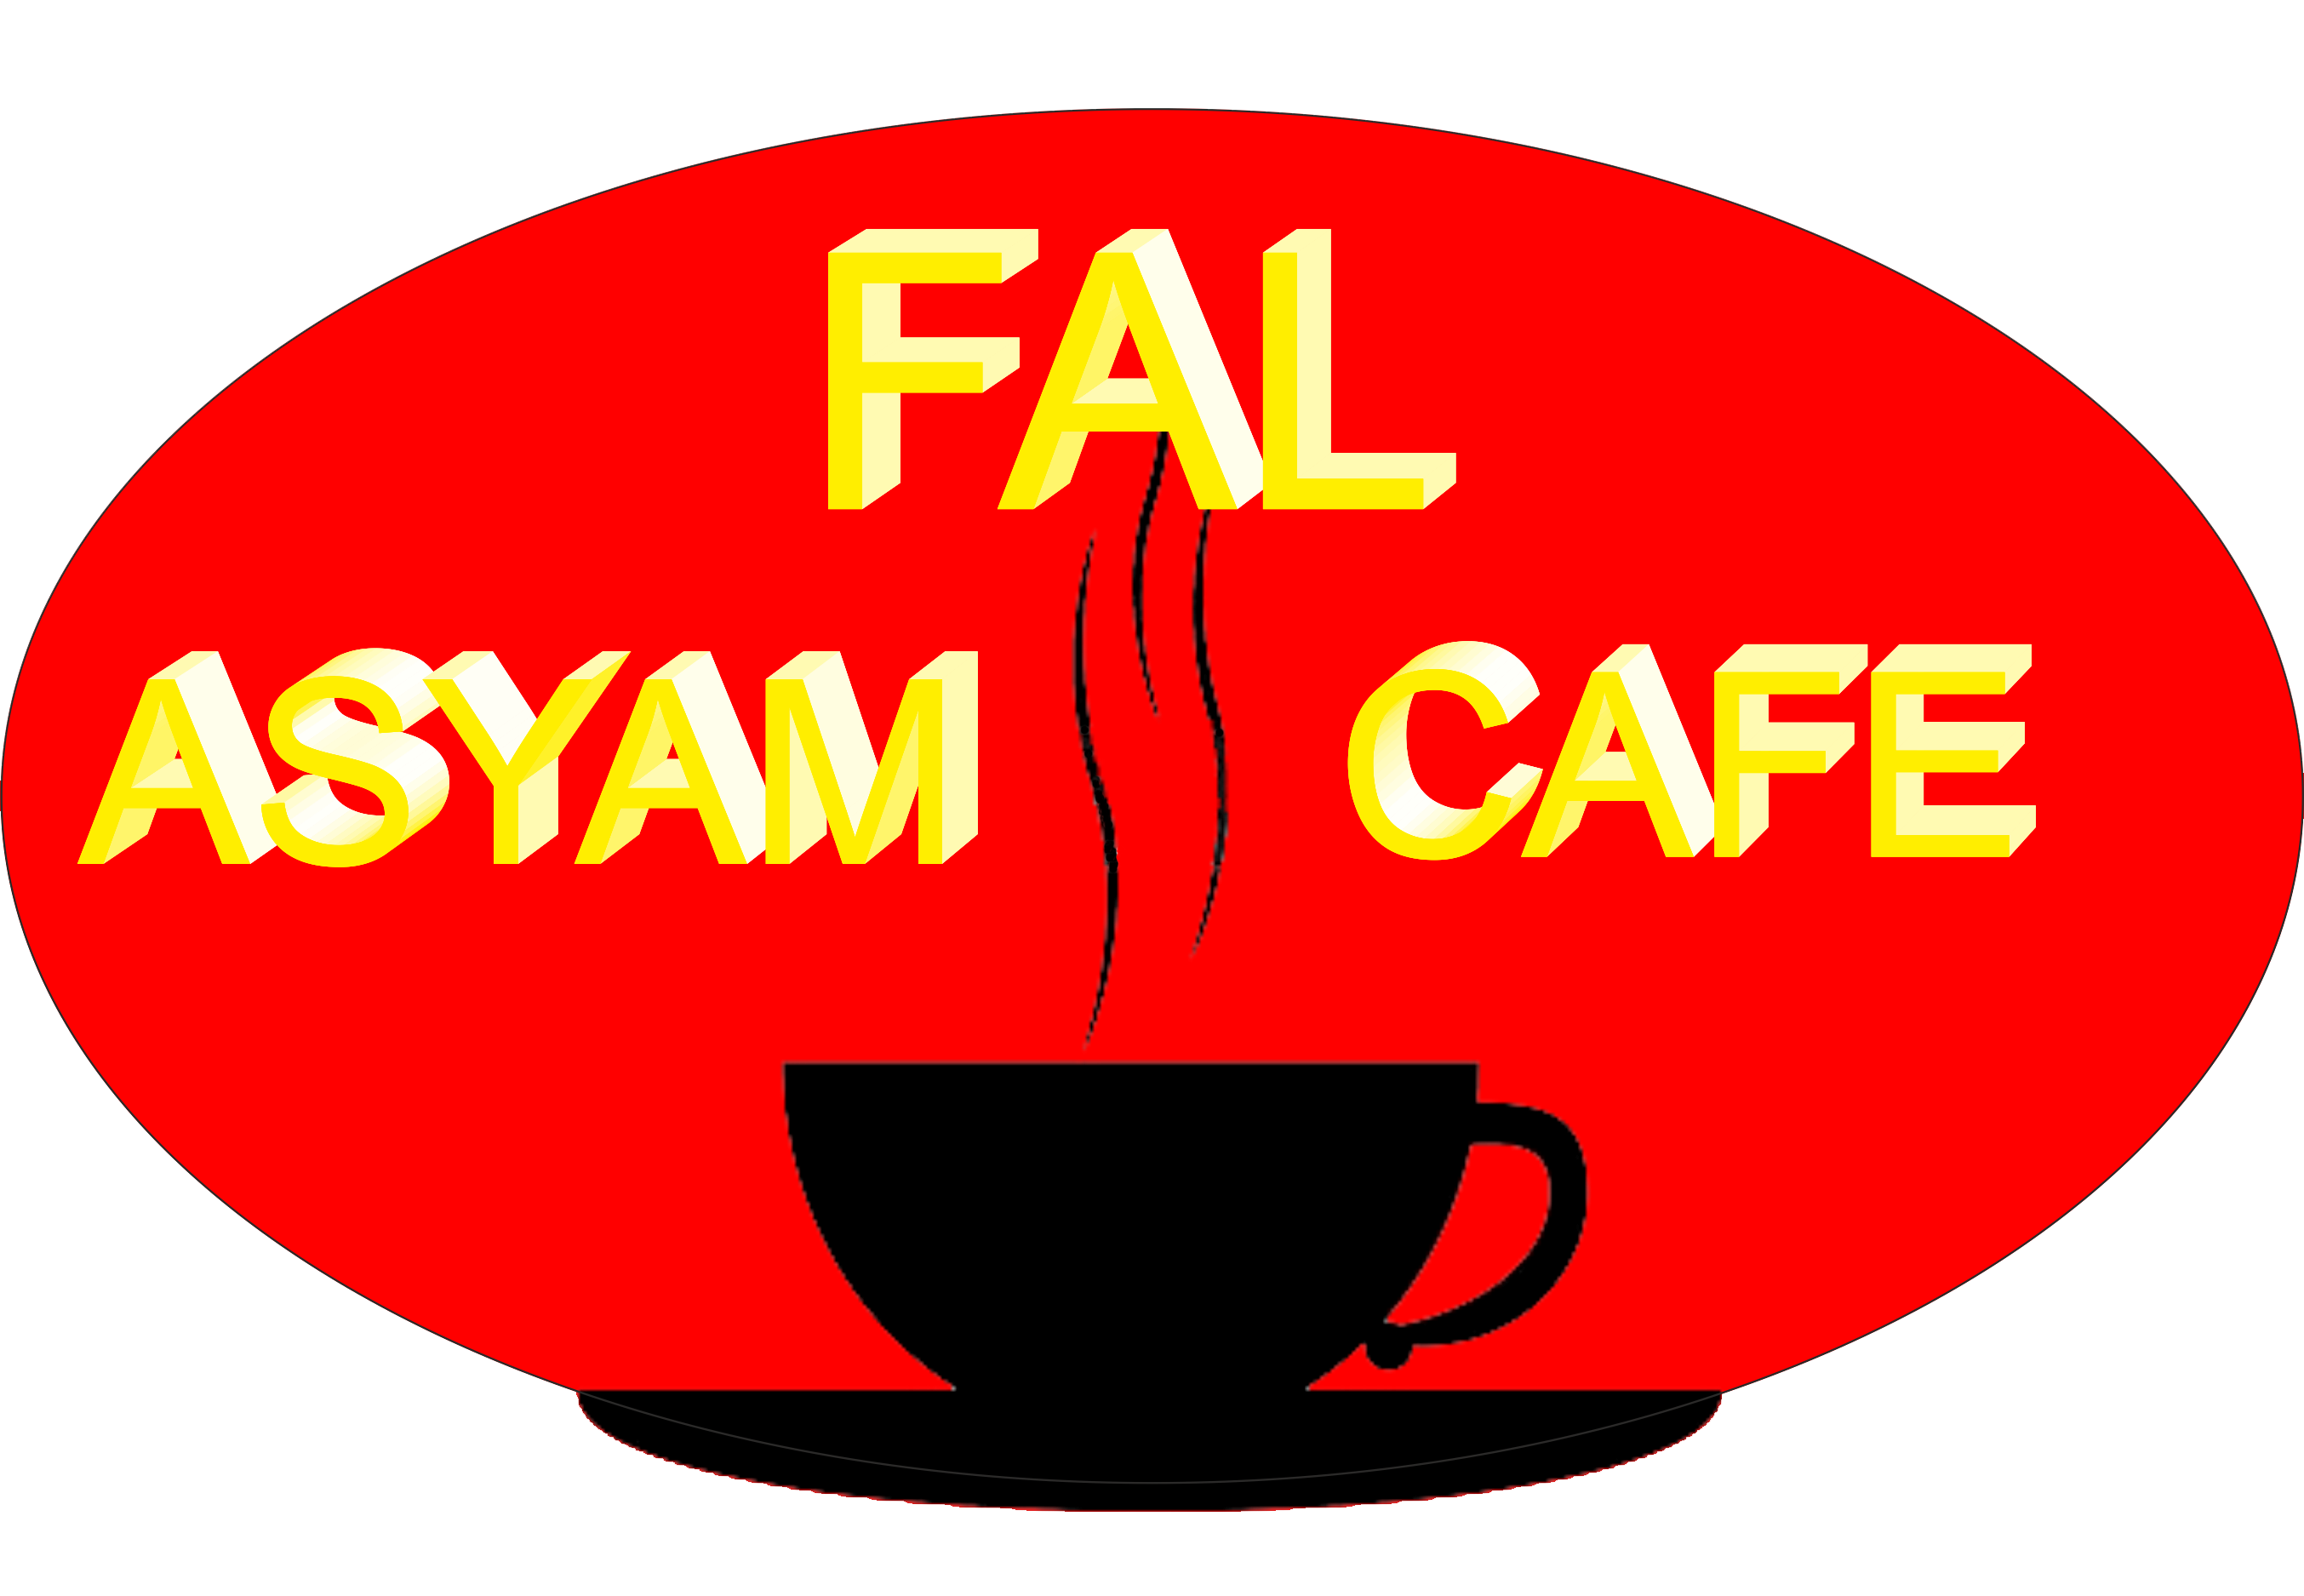 Asyam Fal Cafe ,Cafe - Bistro  , ANKARA ,